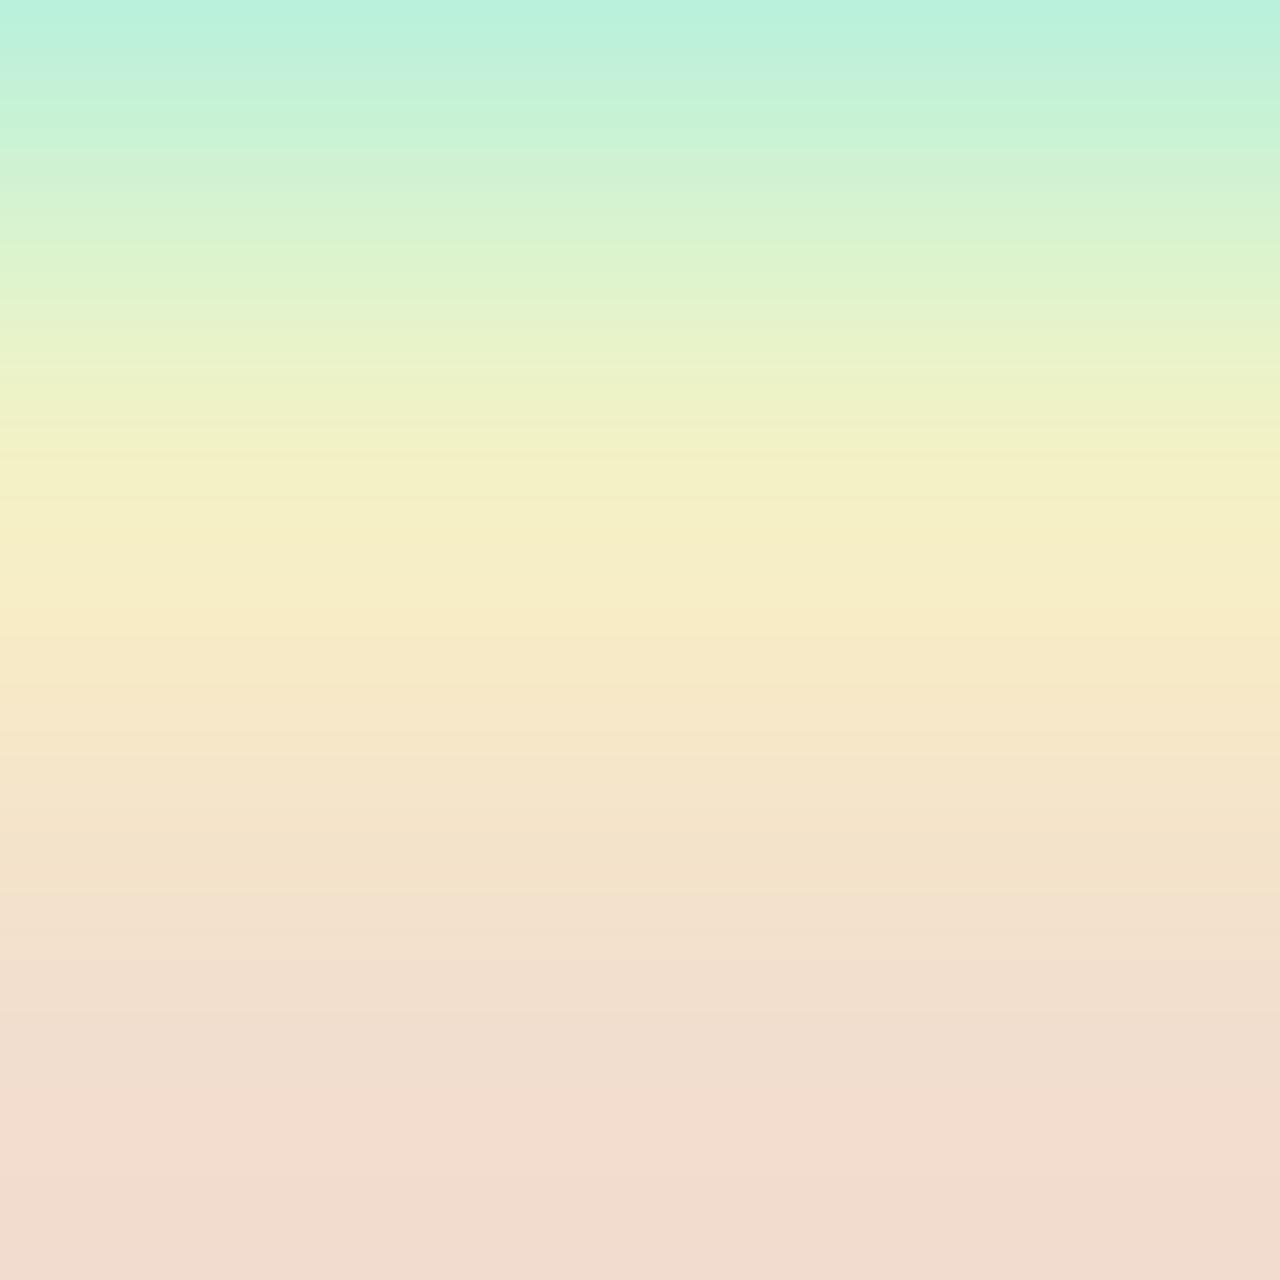 colorful gradient 36903